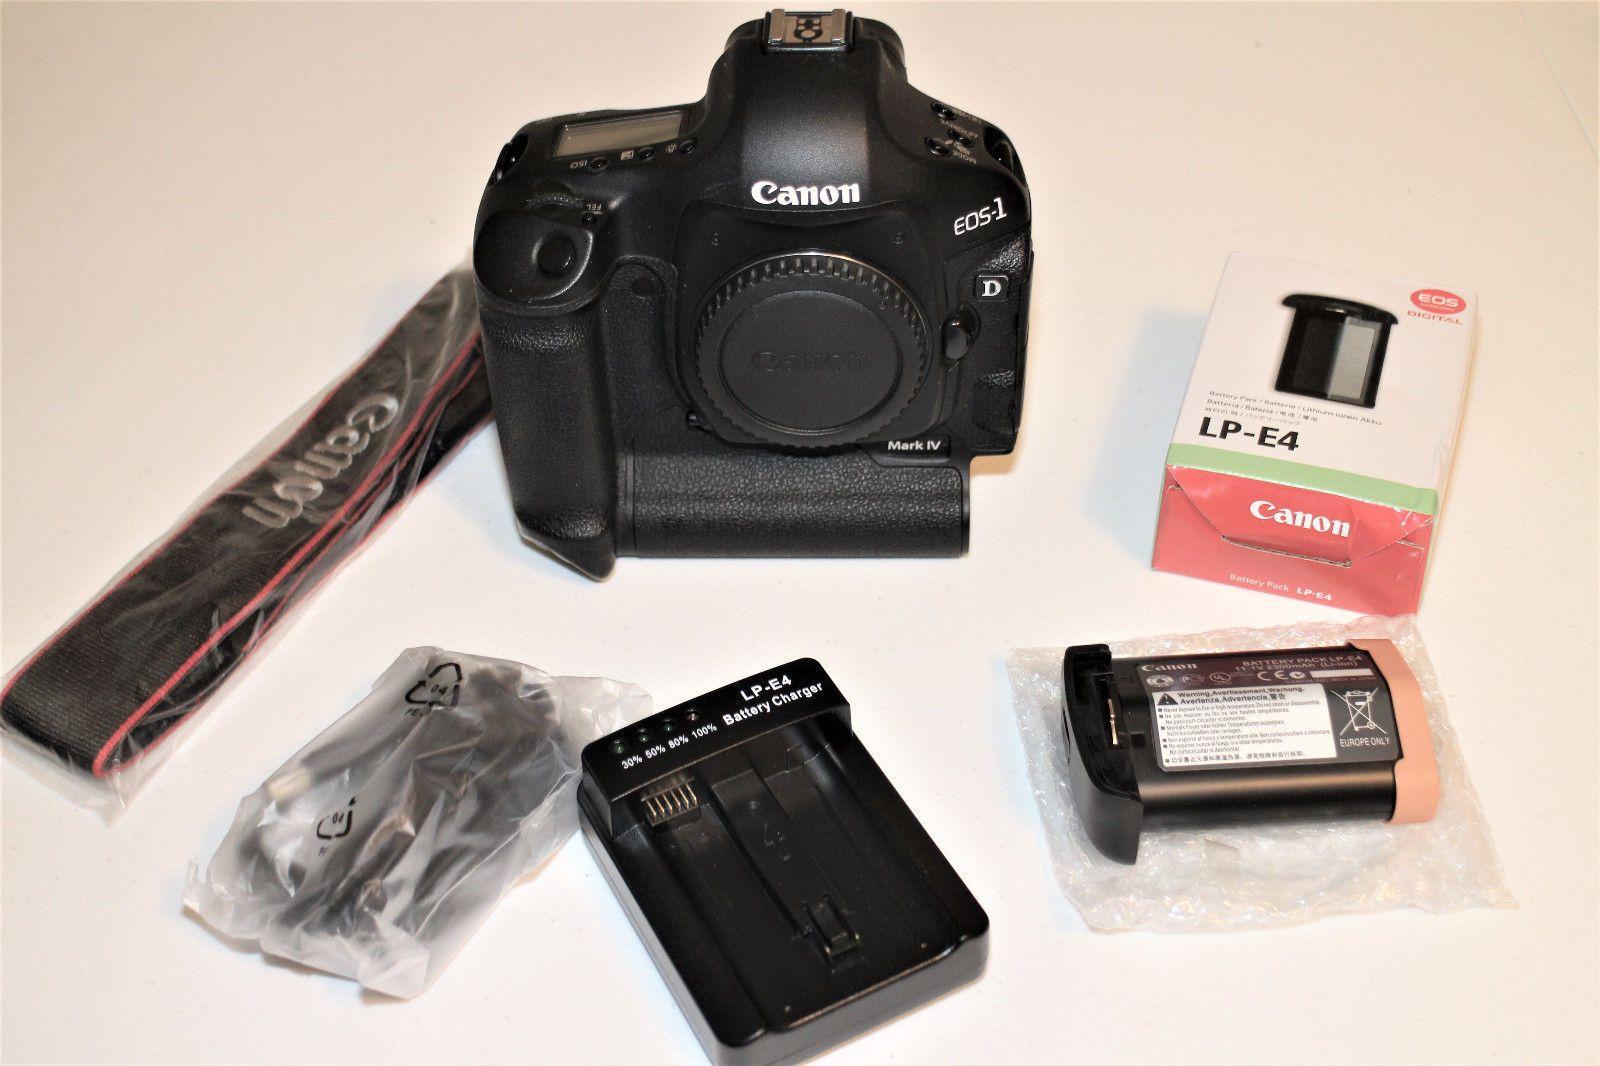 Canon Eos 1d Mark Iv 16 1 Mp Digital Slr Camera Black Body Only Cameras Photo Digital 3822b002 Digital Slr Camera Digital Camera Digital